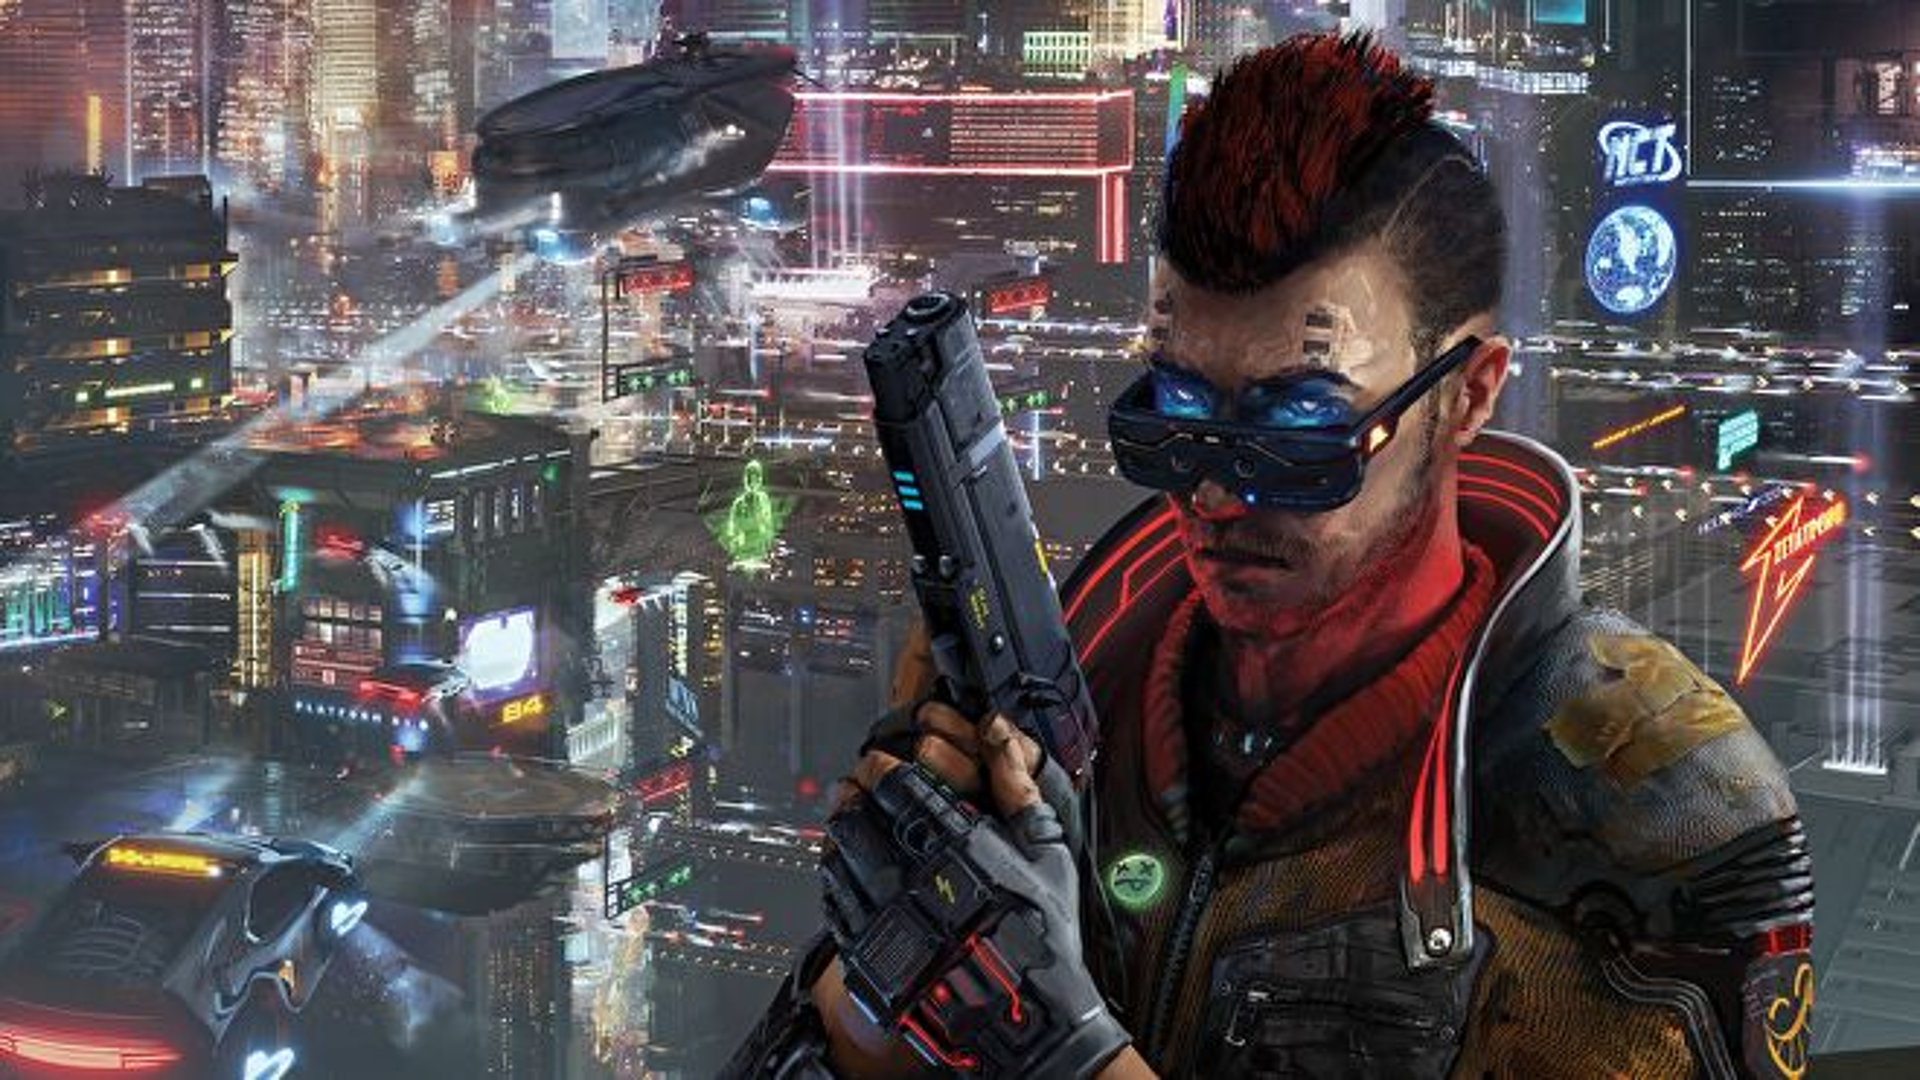 Cyberpunk Red RPG artwork